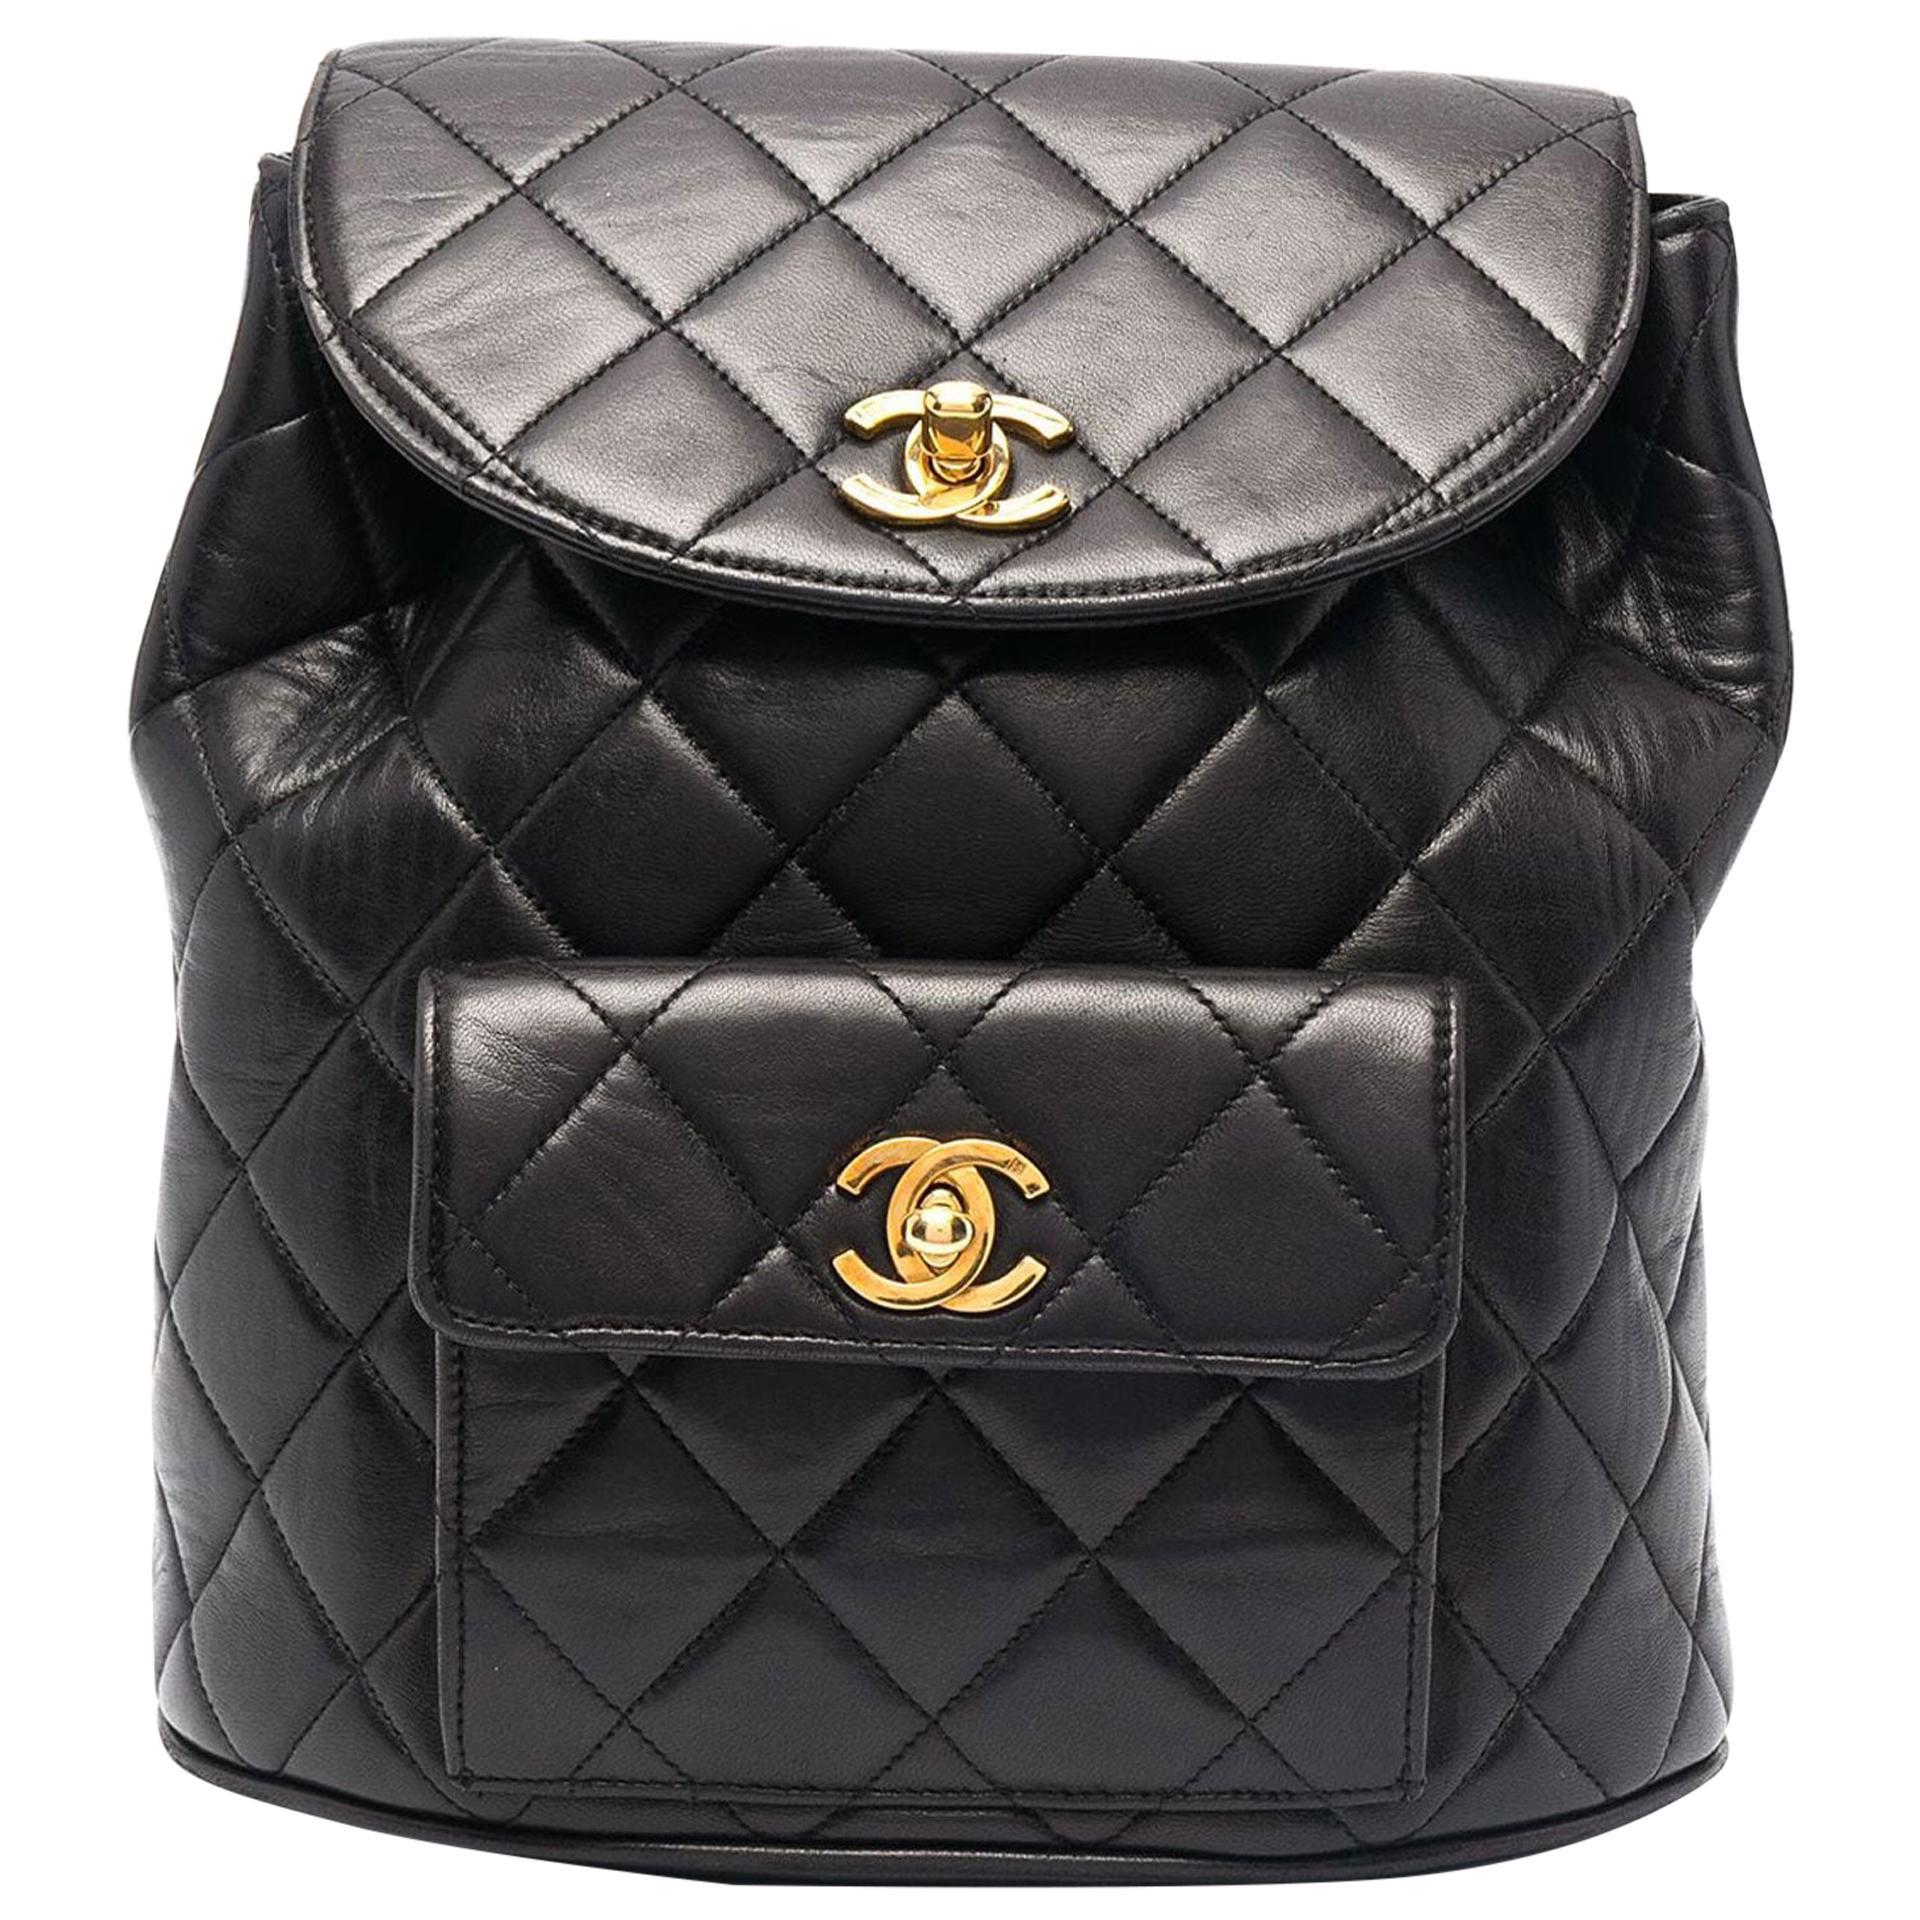 Chanel Black Lambskin Quilted Medium 90's Vintage Backpack